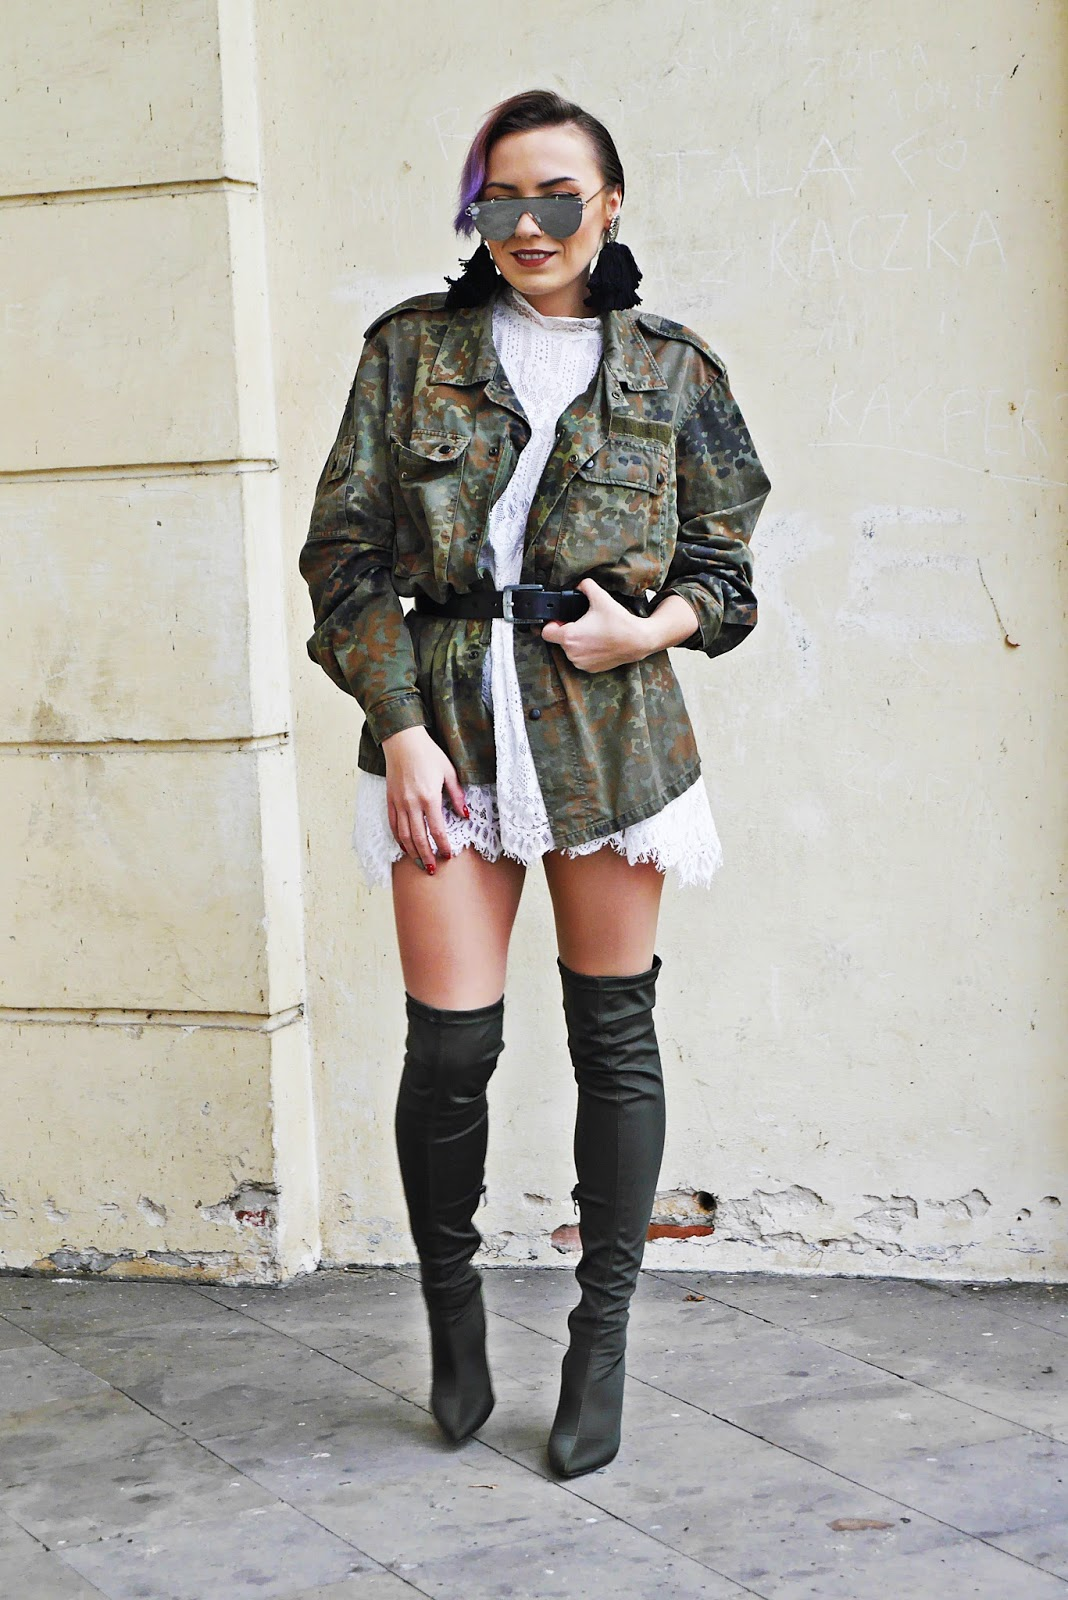 6_moro_kurtka_sh_koronkowa_biala_sukienka_karyn_blog_buty_renee_031217